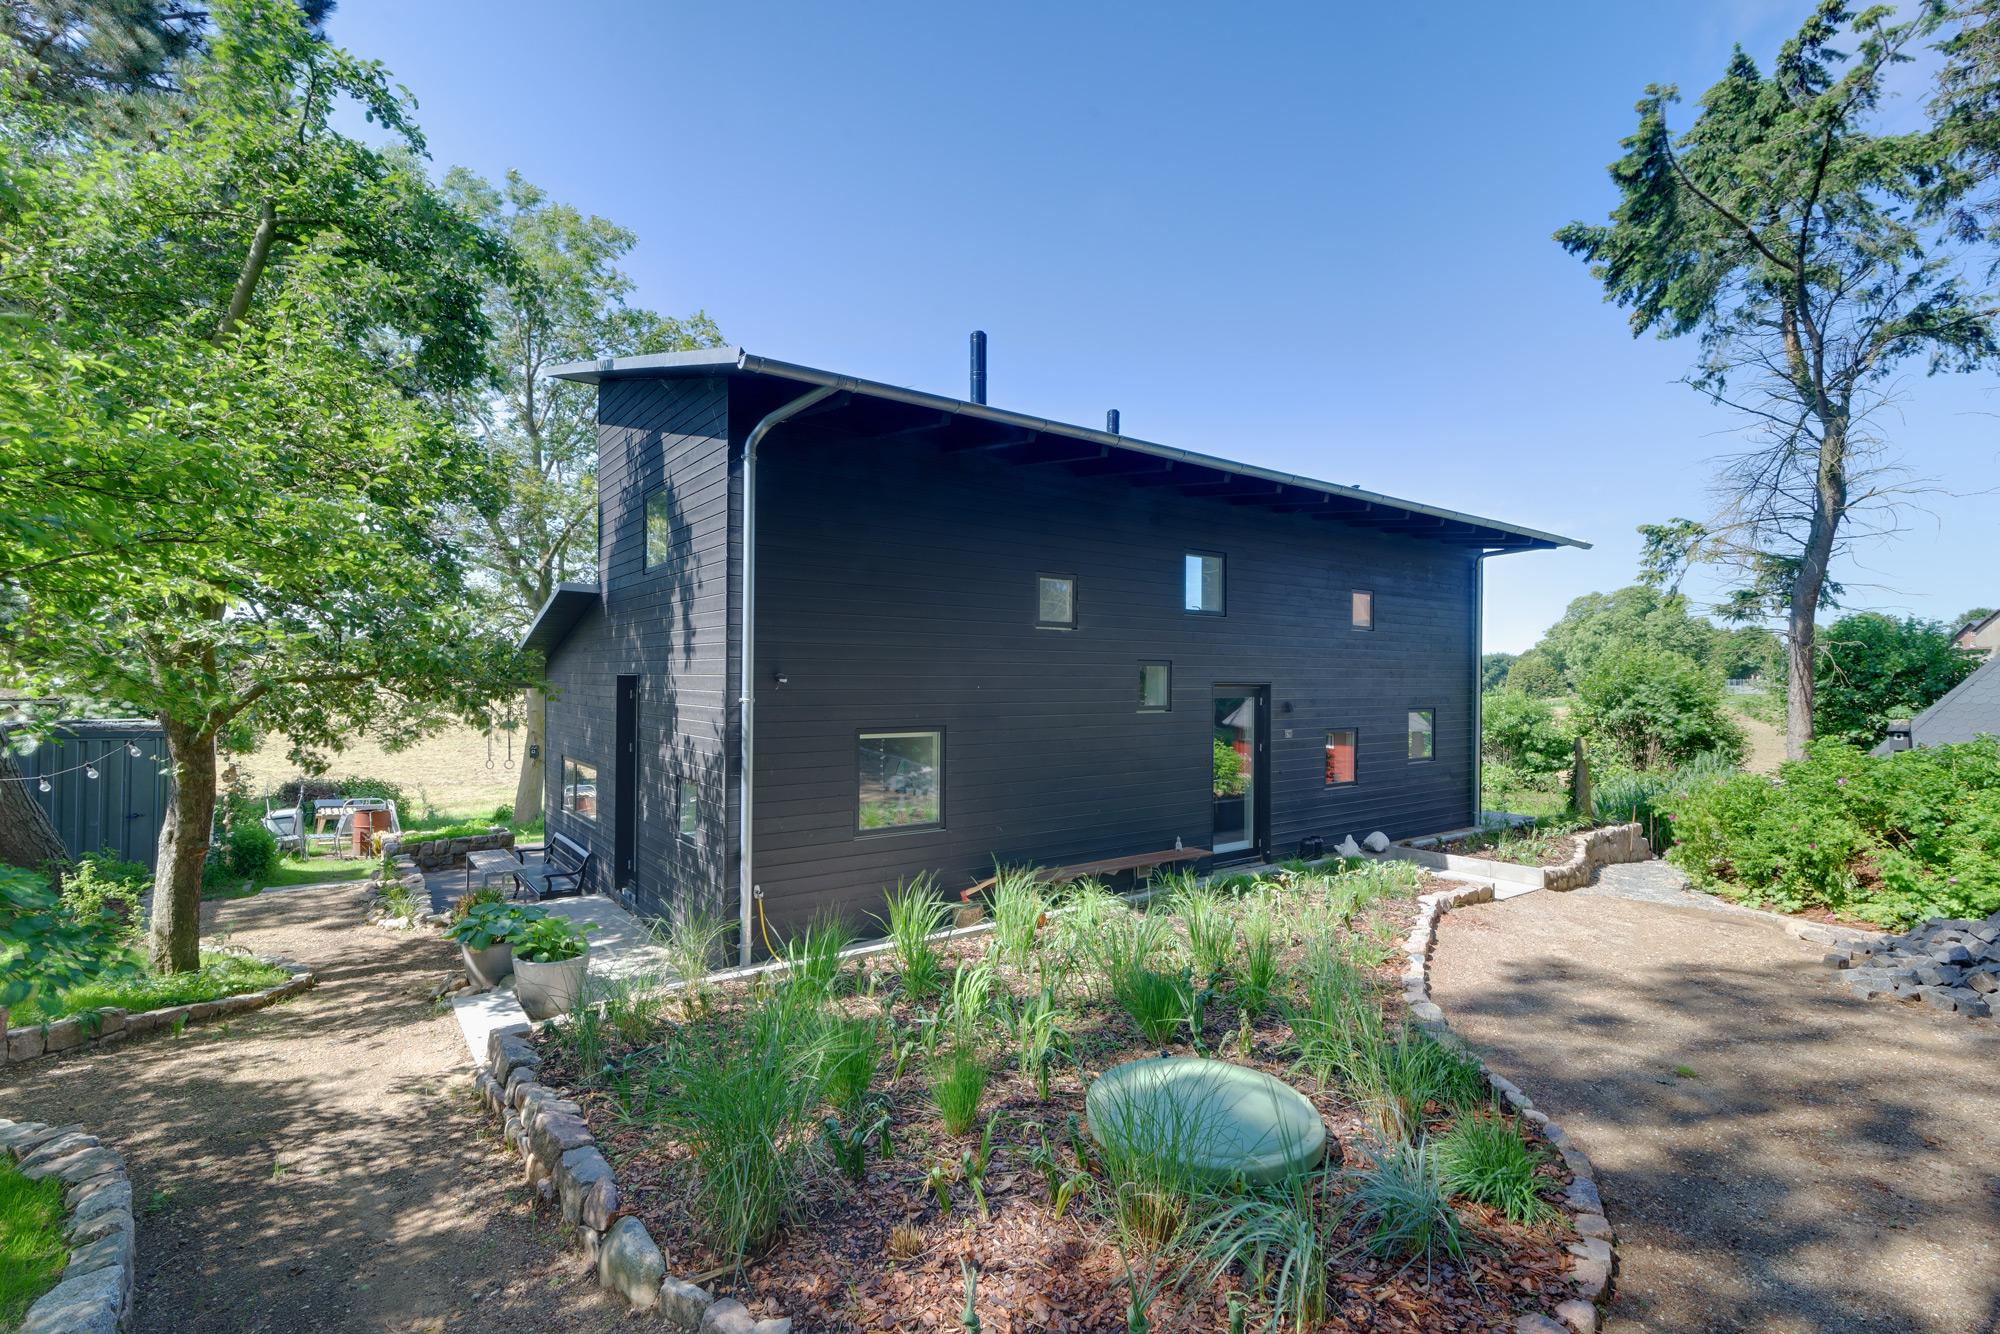 AHK, Neubau eines Ferienhauses, 2016-2018, realisiert